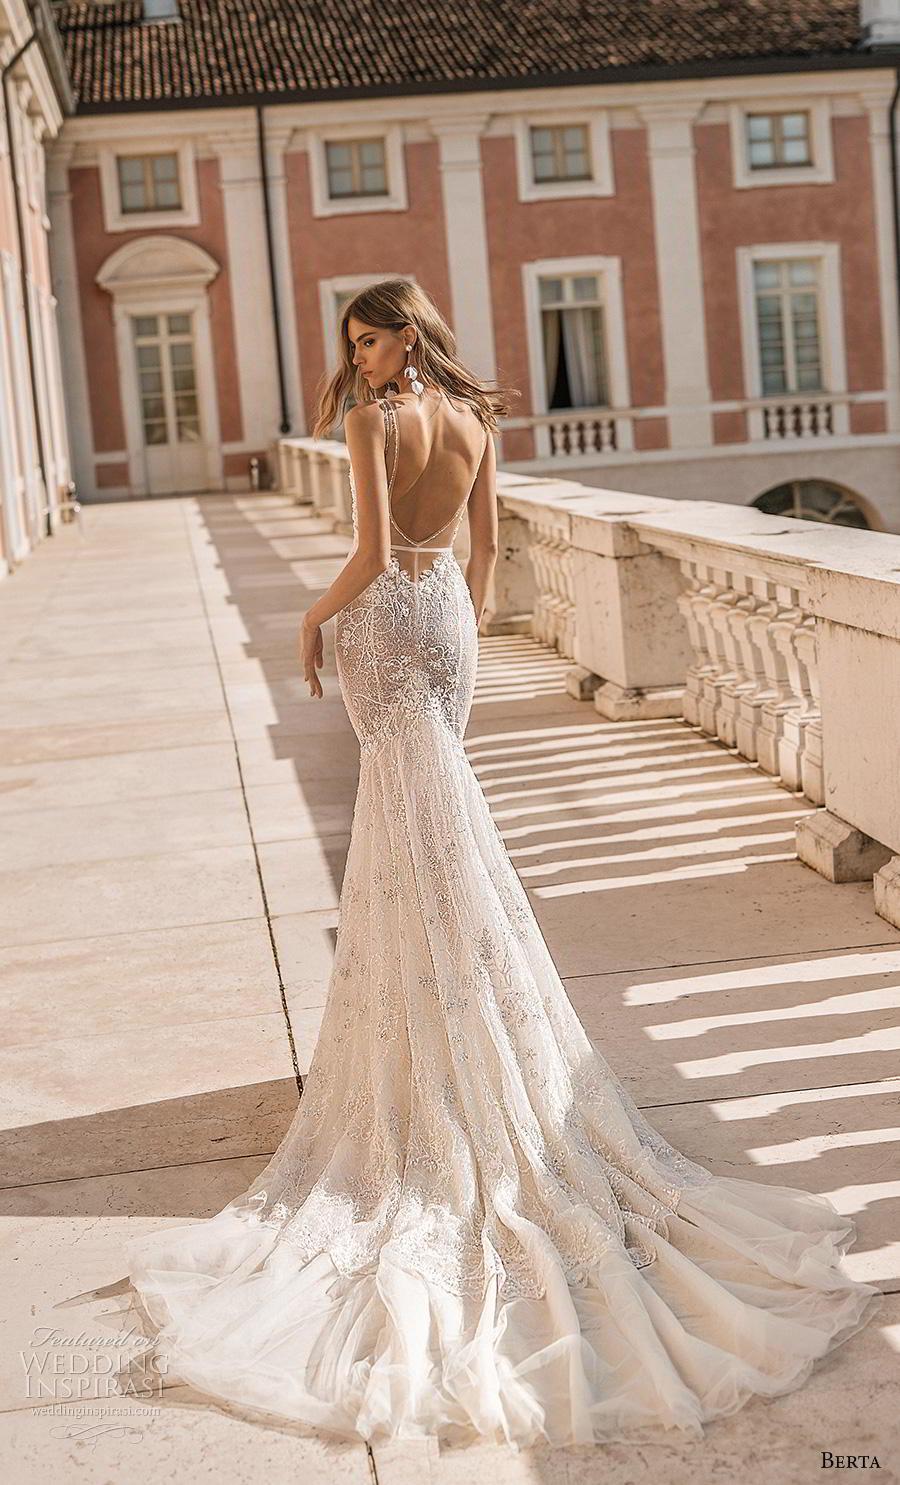 berta 2019 privee bridal thin strap sweetheart neckline heavily embellished bodice bustier sexy romantic mermaid wedding dress low open back backless chapel train (2) bv